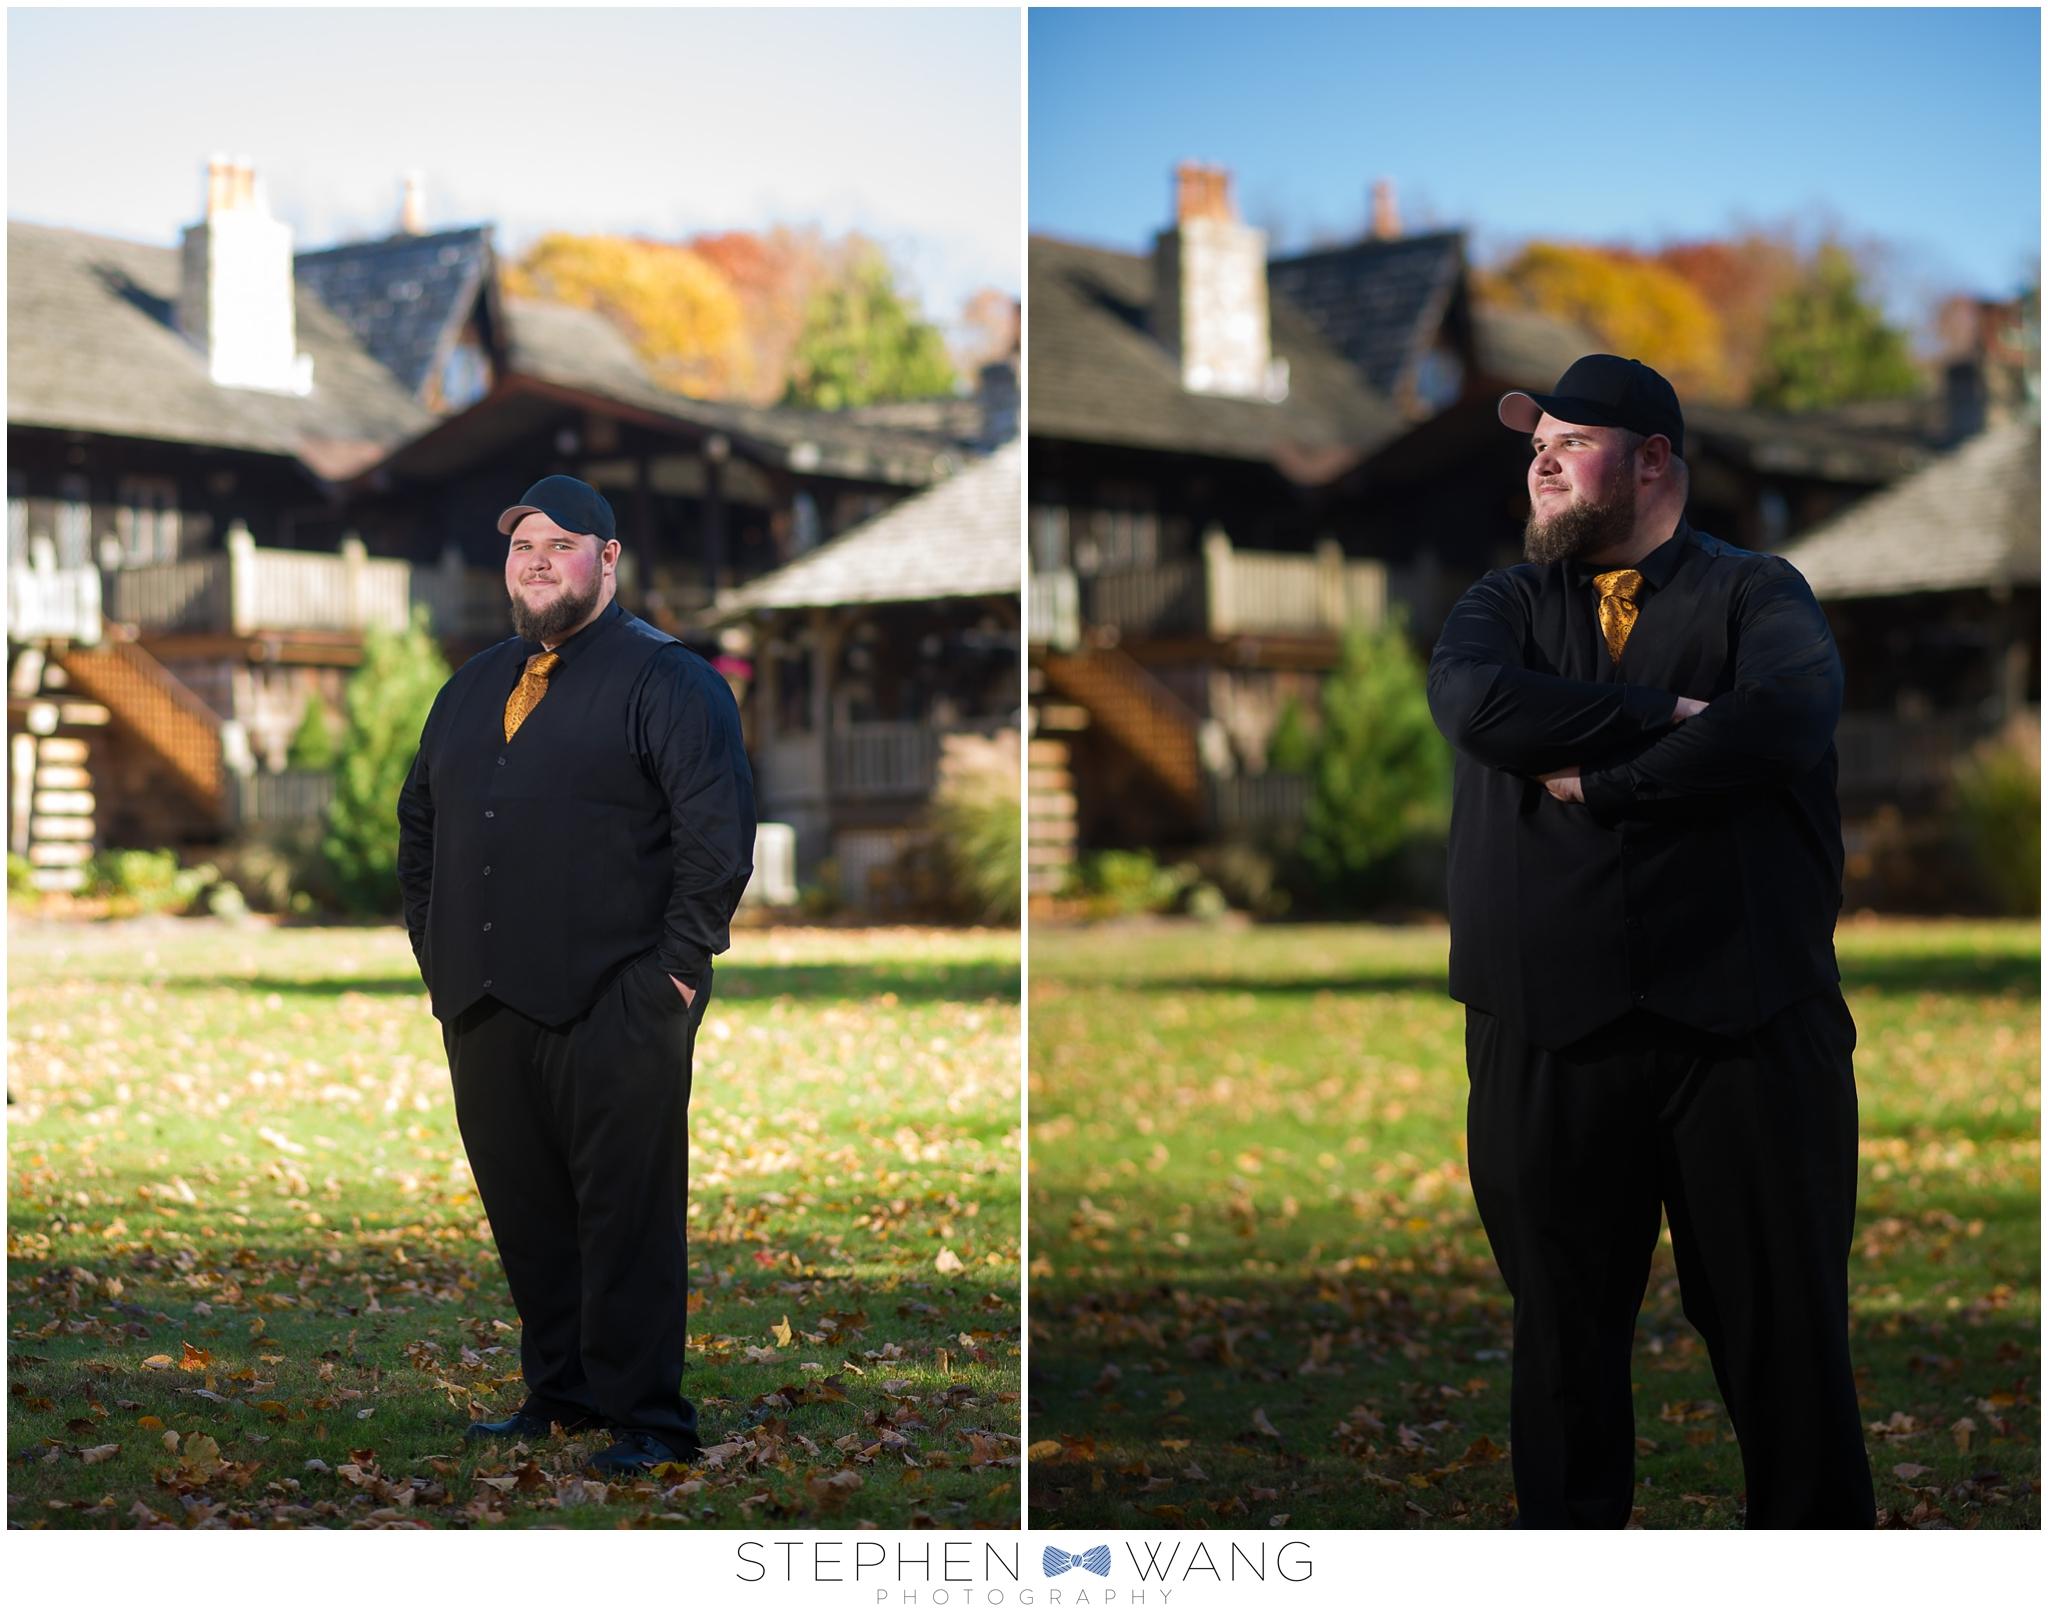 Stephen Wang Photography Wedding Connecticut CT Bill Miller's Castle Branford CT Halloween New England Wedding New Haven-12-02_0007.jpg